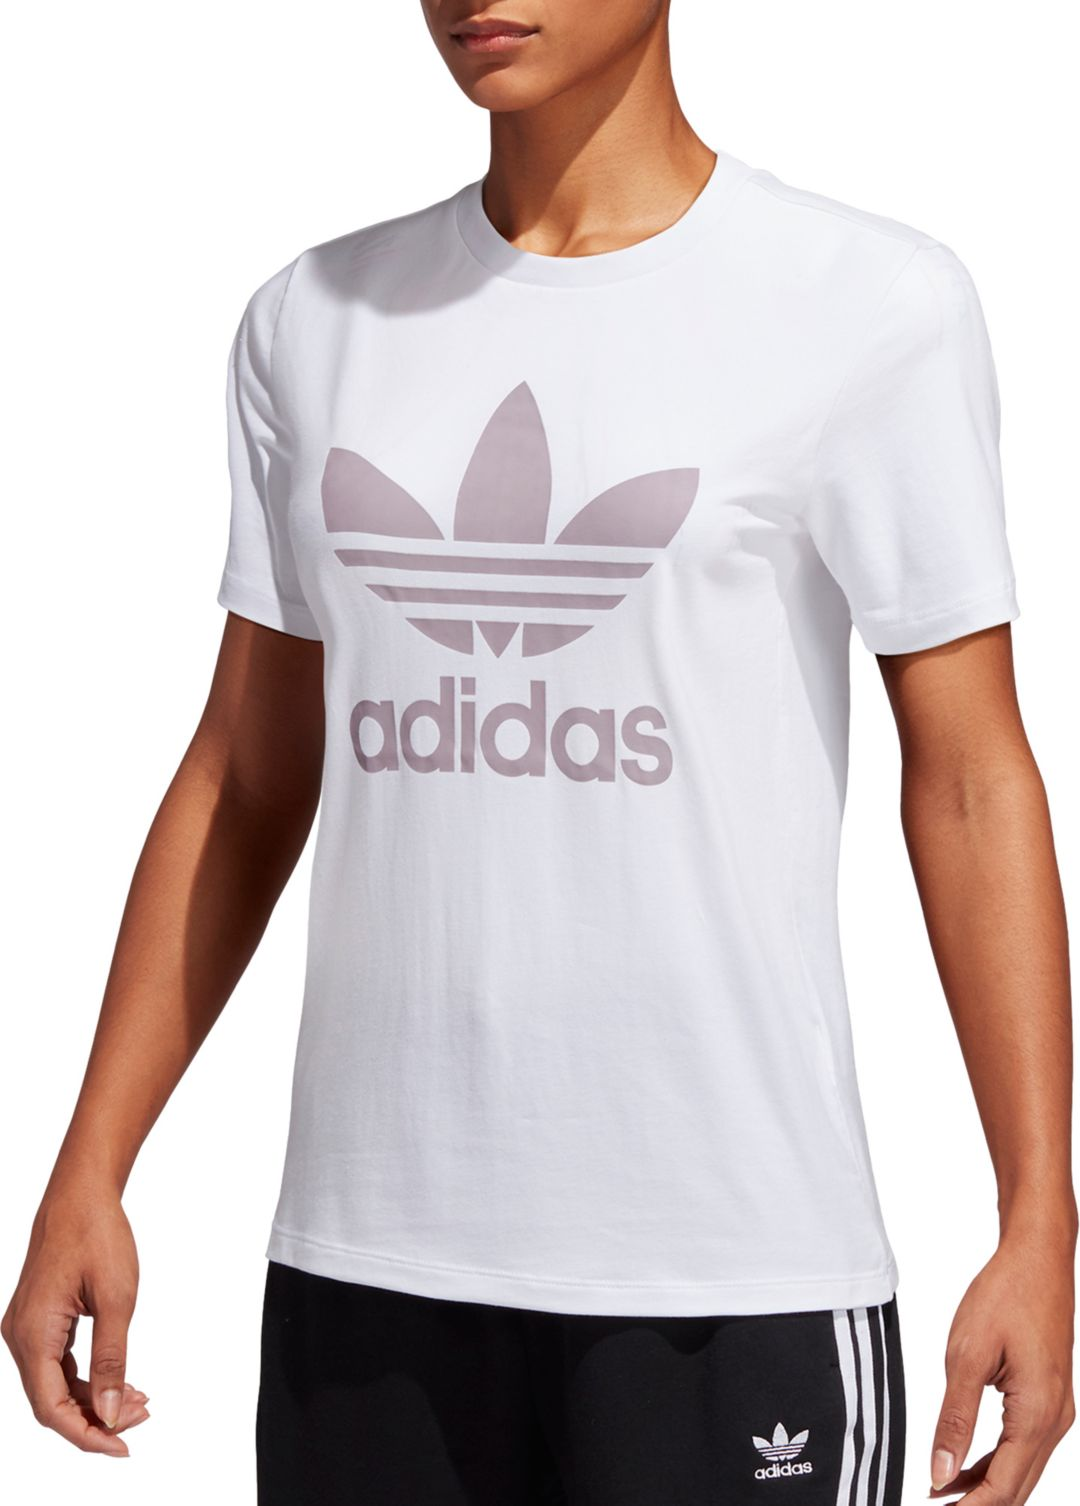 adidas Originals Women's Trefoil T Shirt